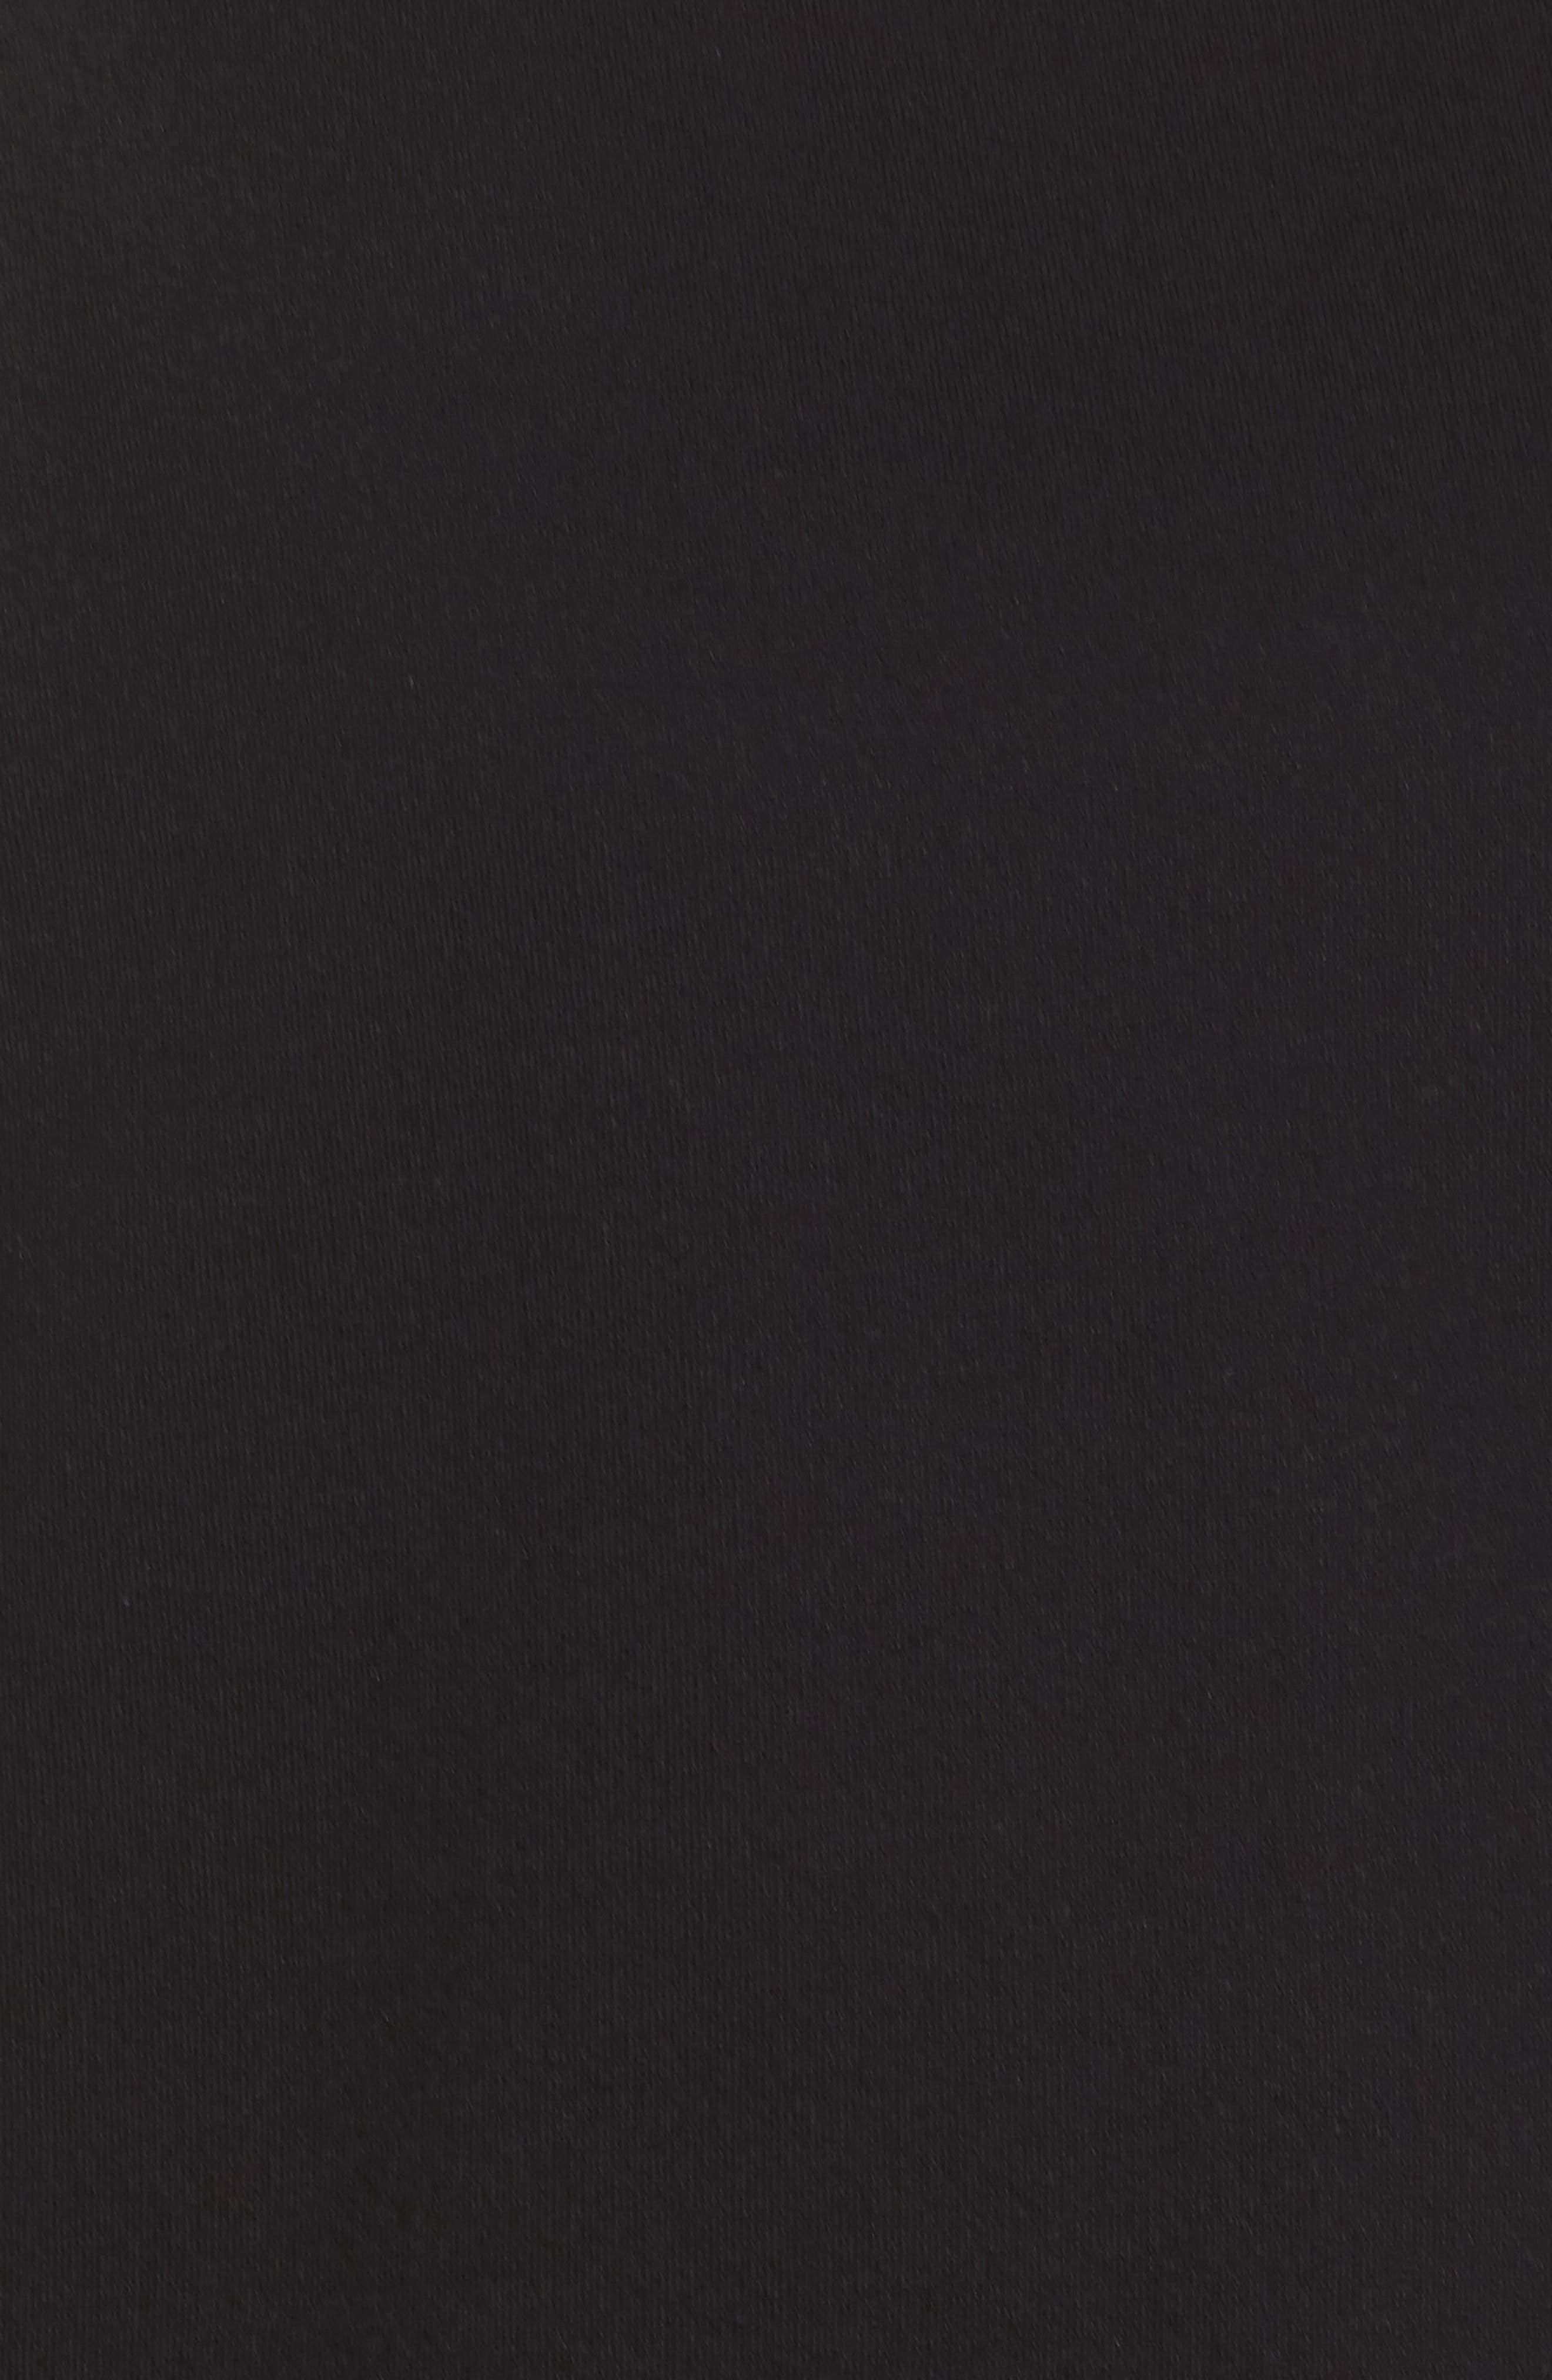 Exhale Sweatshirt,                             Alternate thumbnail 6, color,                             Black